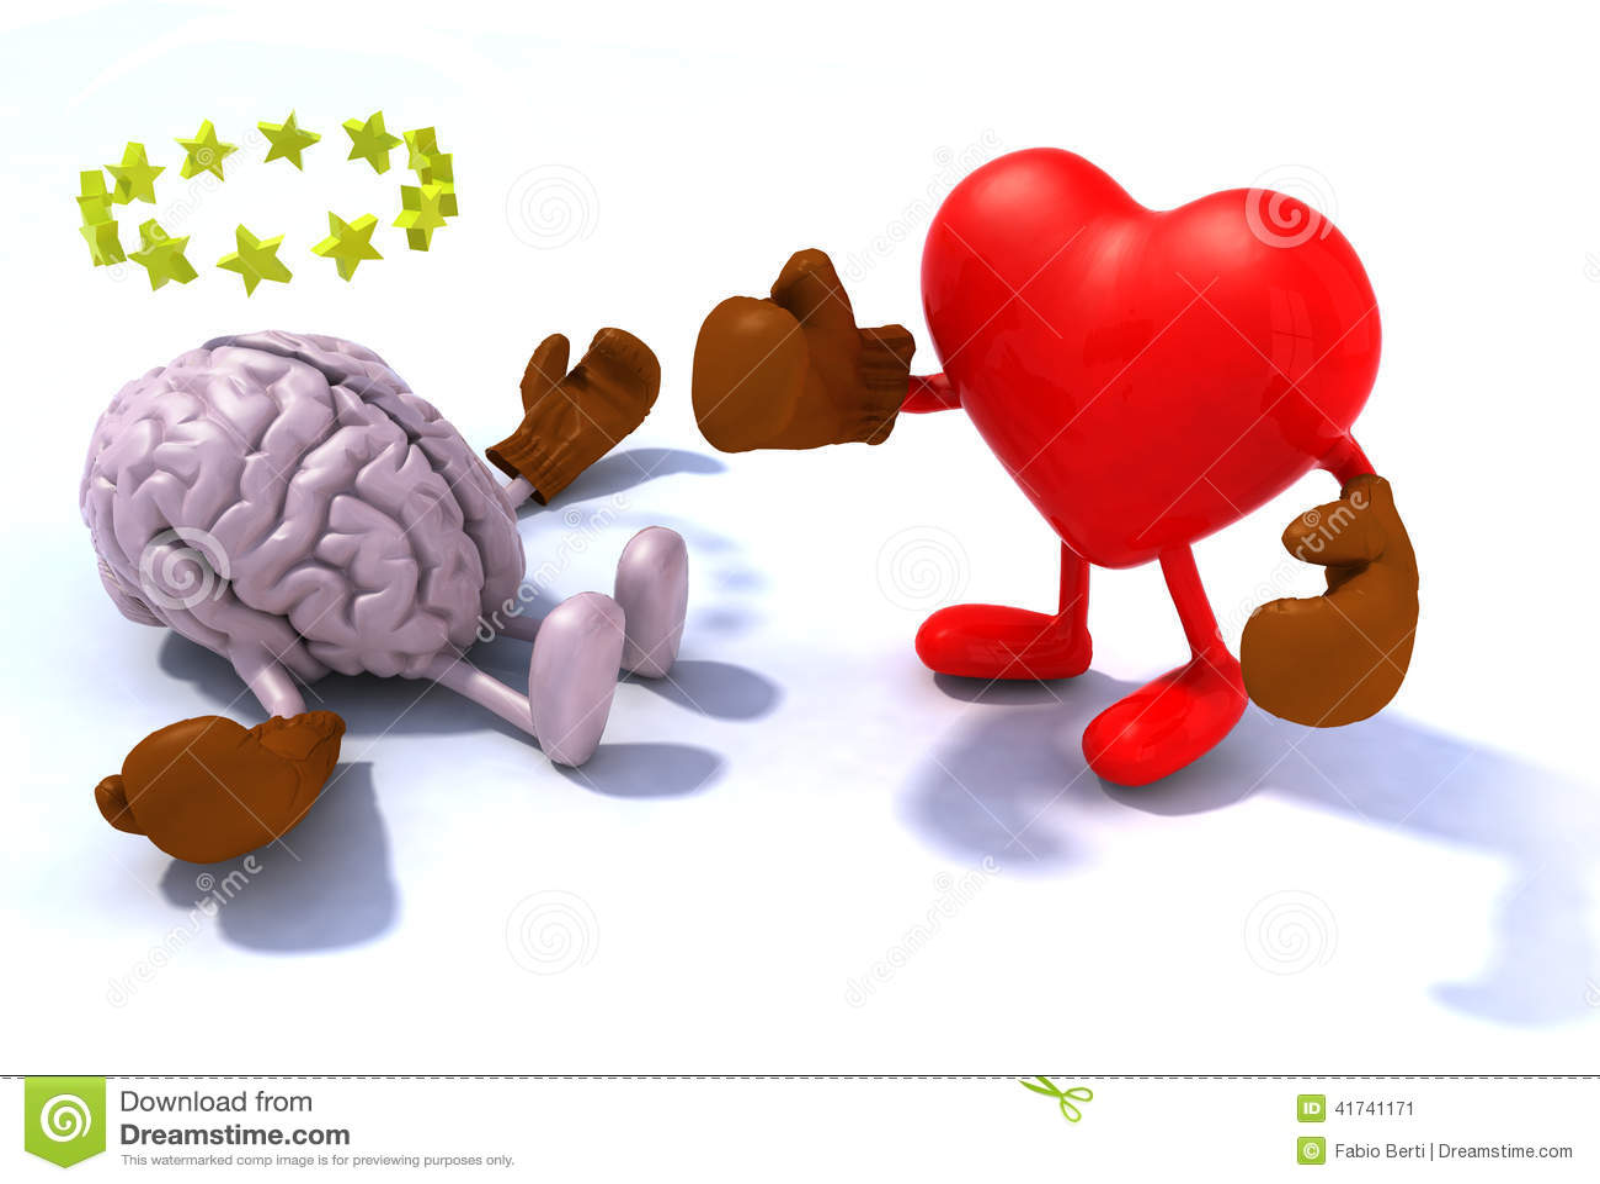 Heart fighting brain